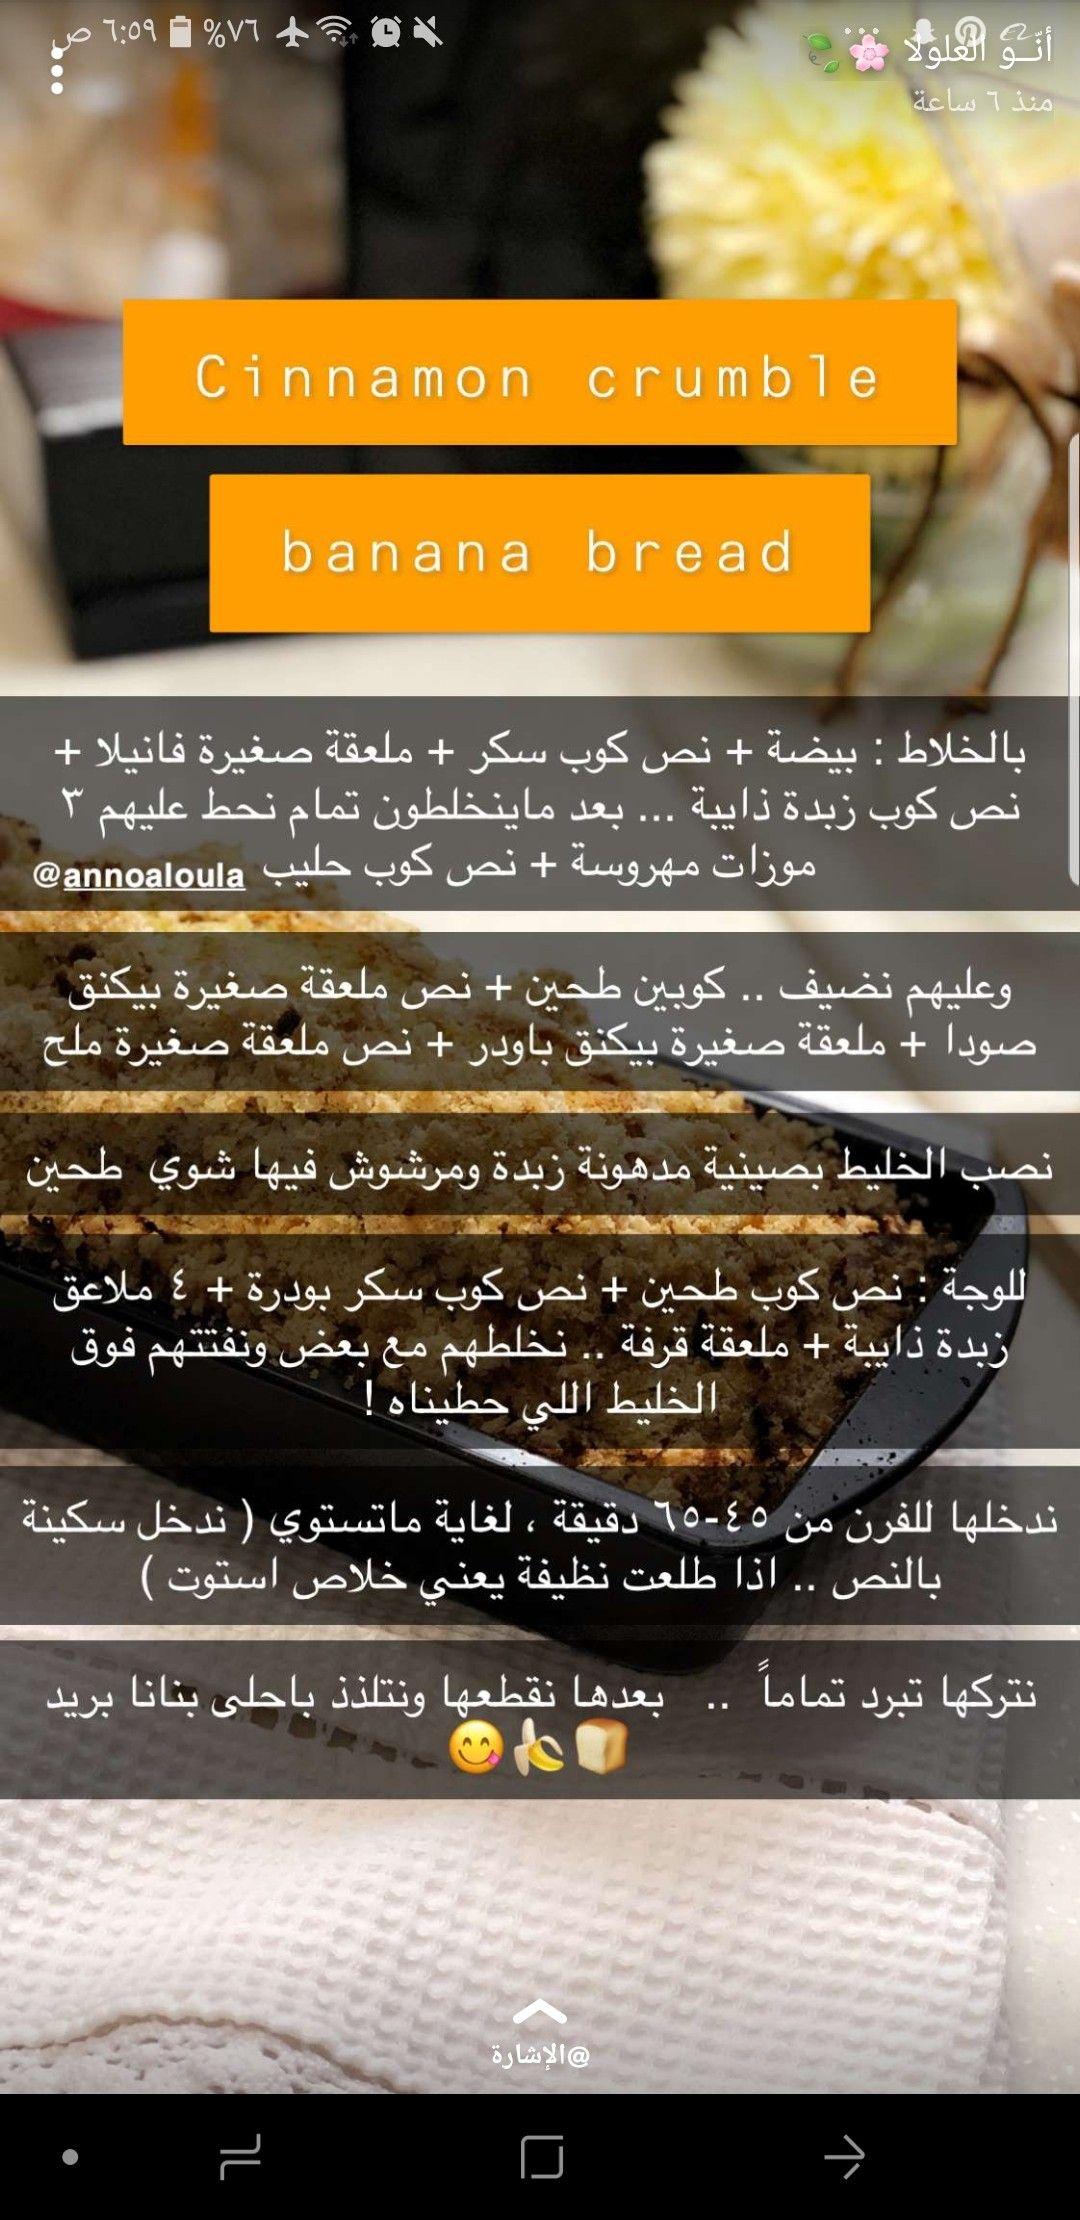 212 Recipe Yummy Delicious Banana Bread: Cinnamon Crumble, Crumble, Banana